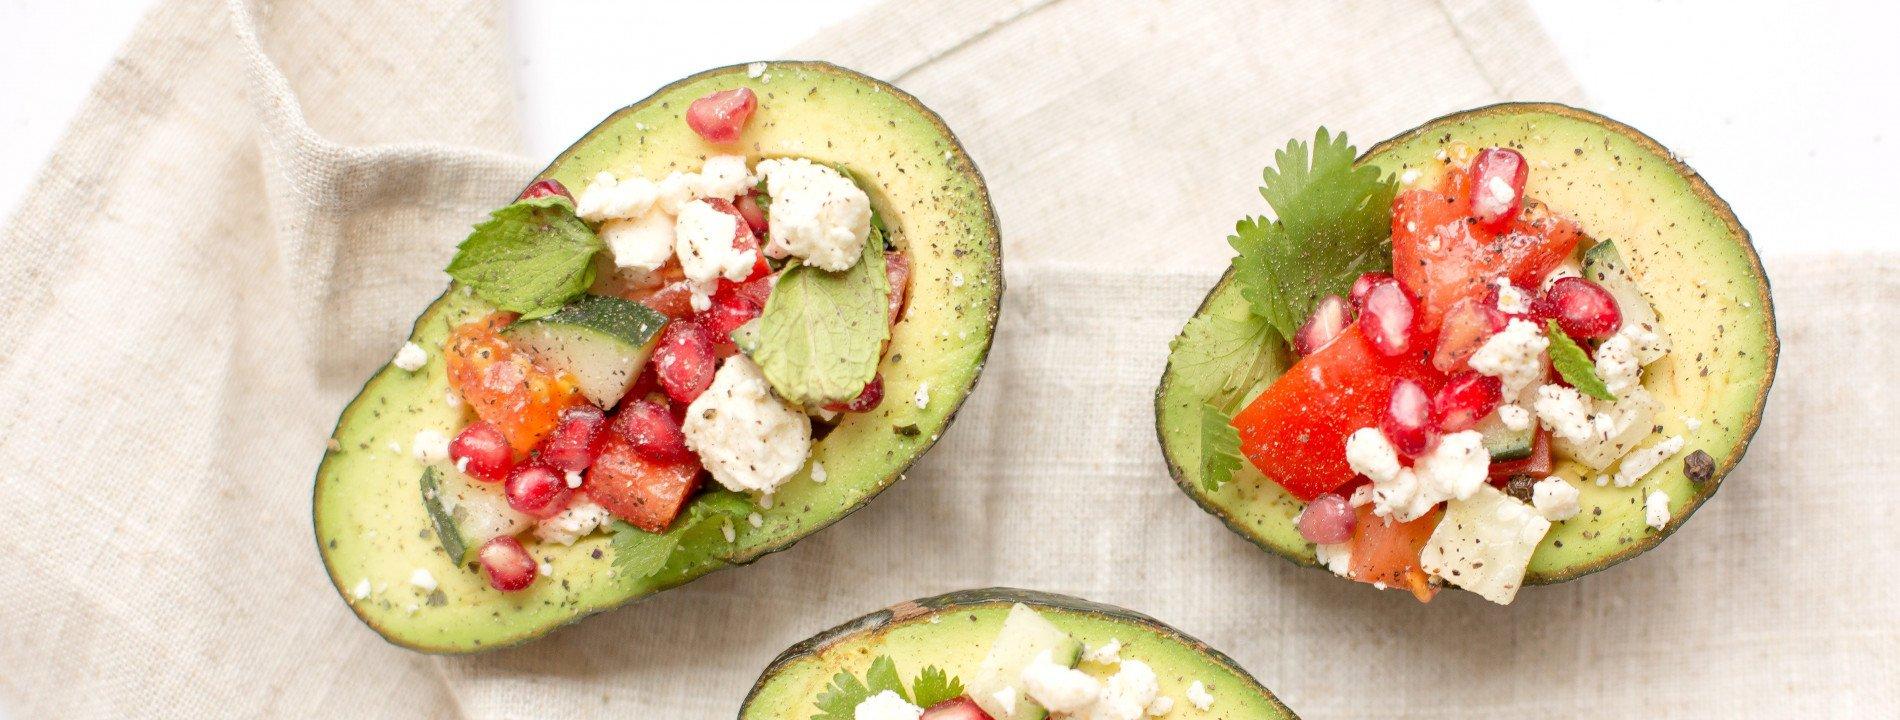 Healthy and Easy Snacks - Paleo - Module II